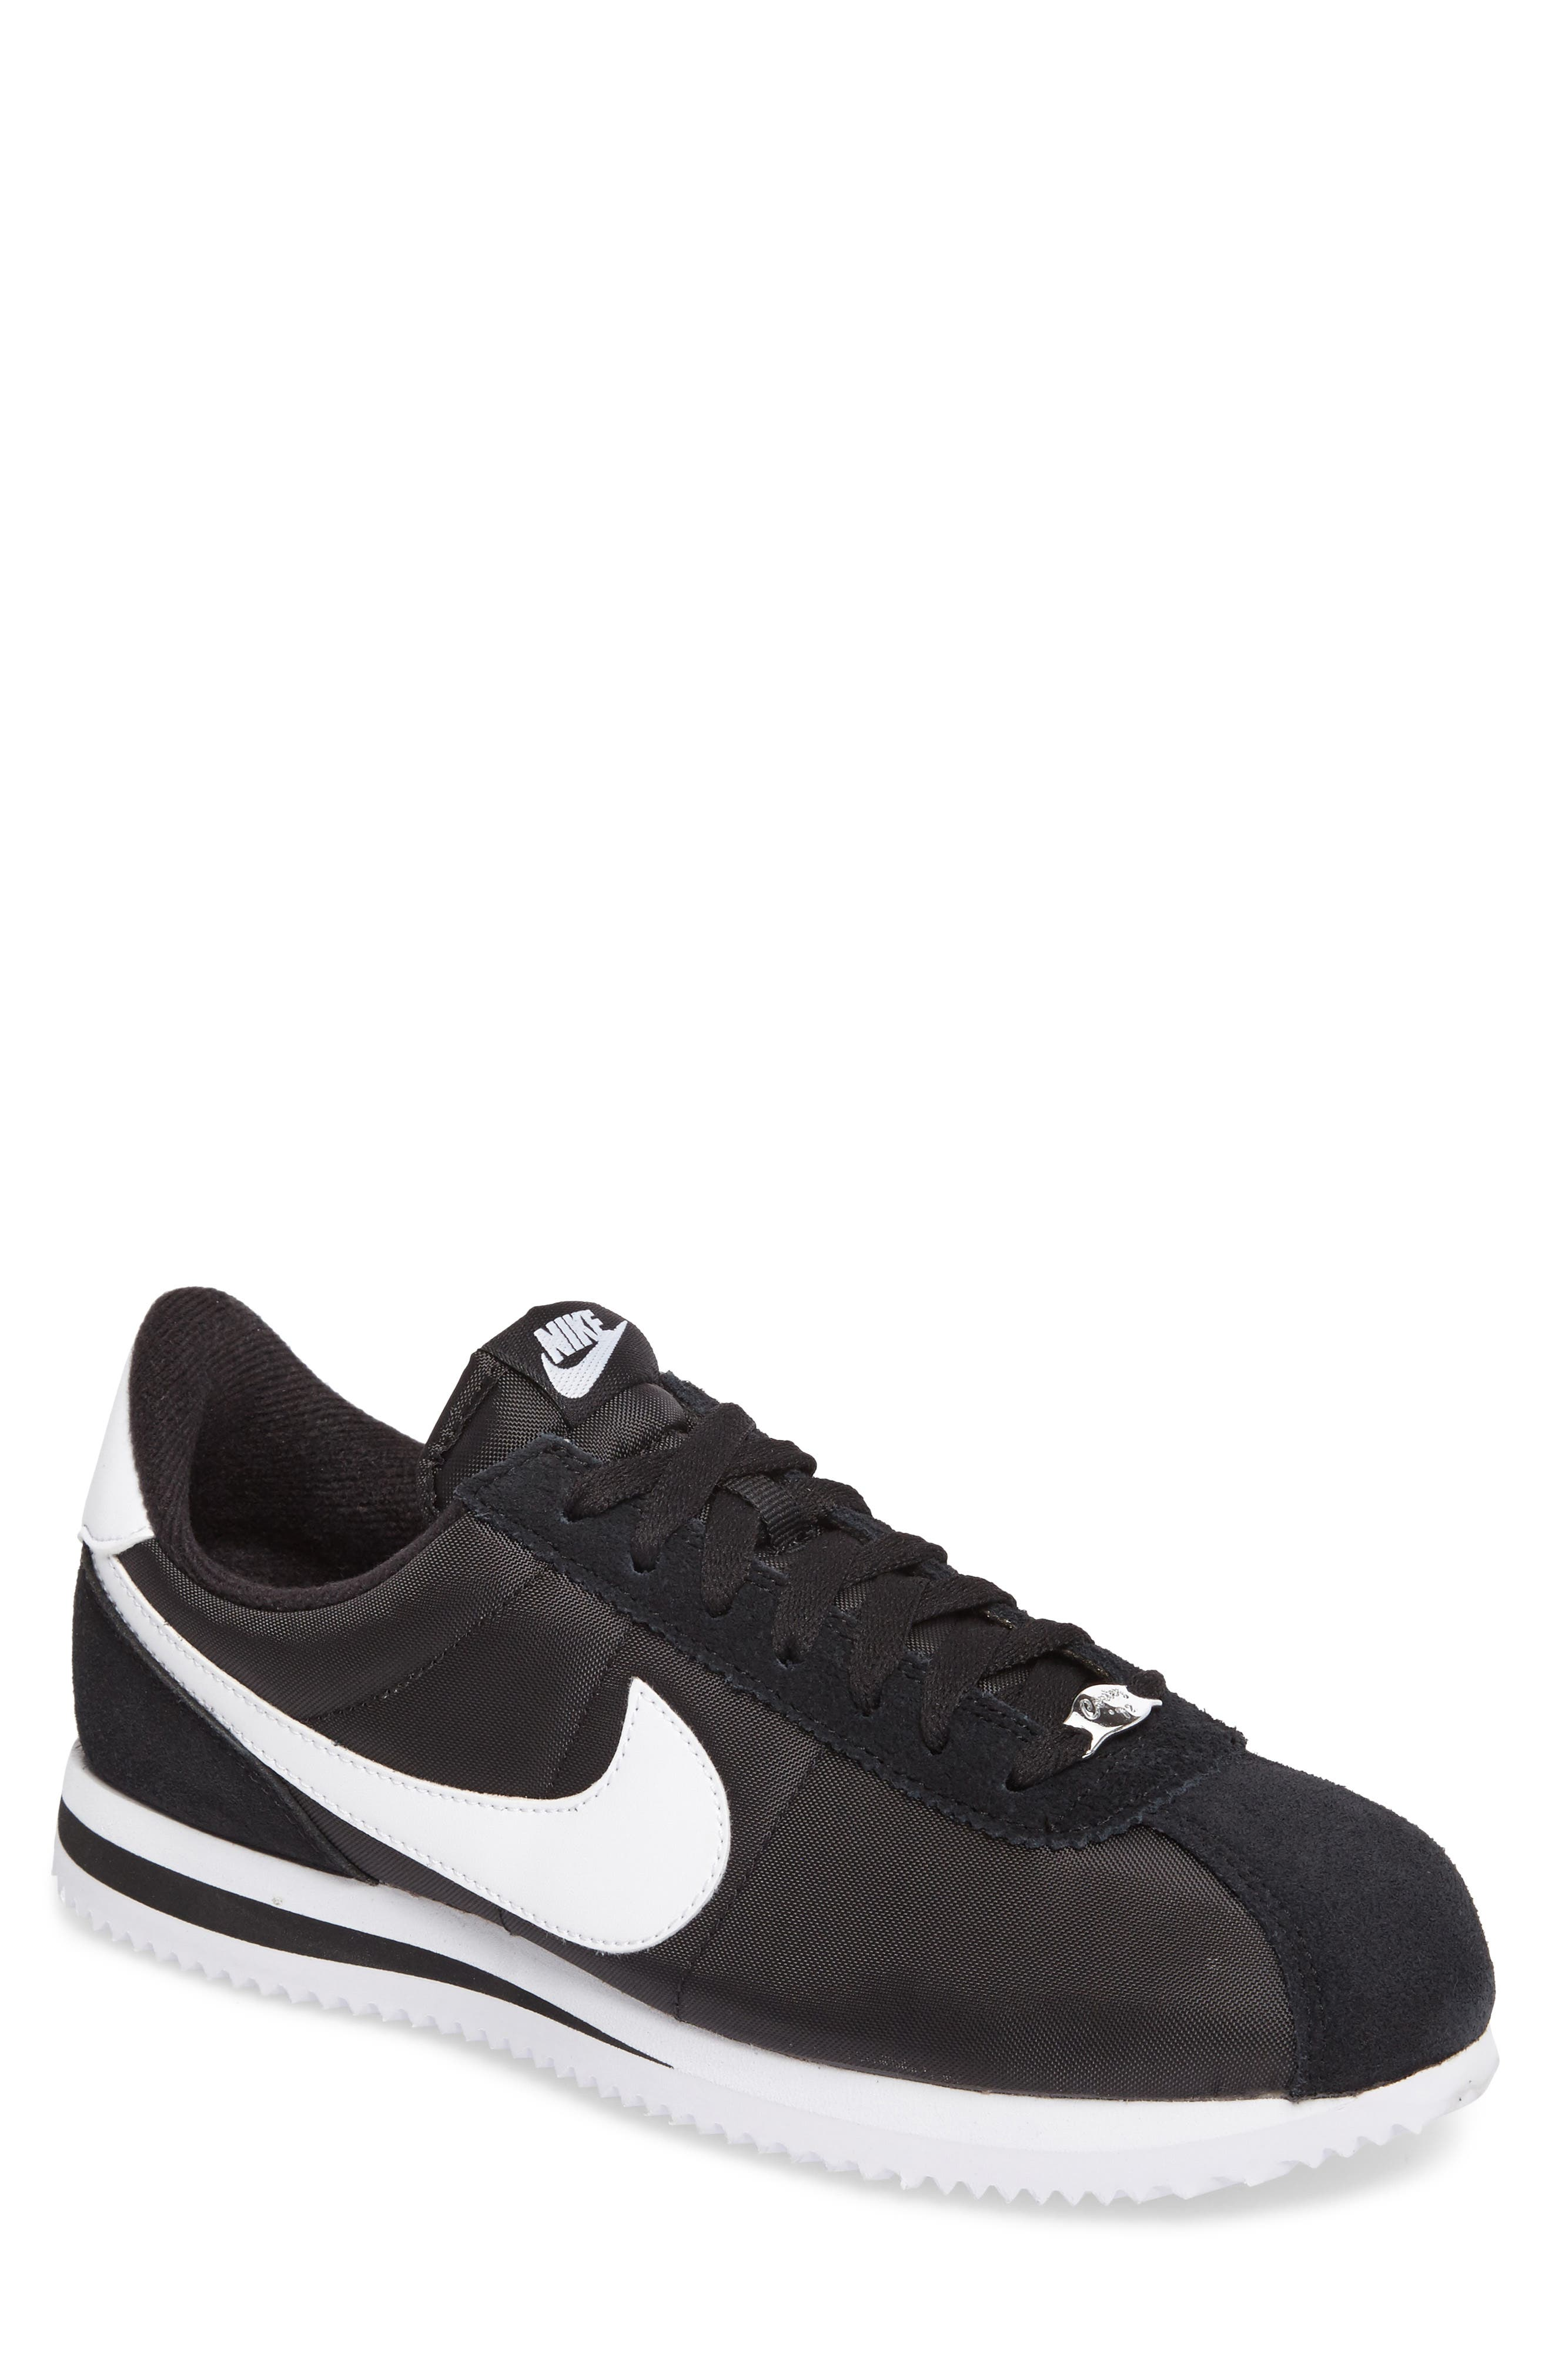 Main Image - Nike Cortez Basic Nylon Sneaker (Men)